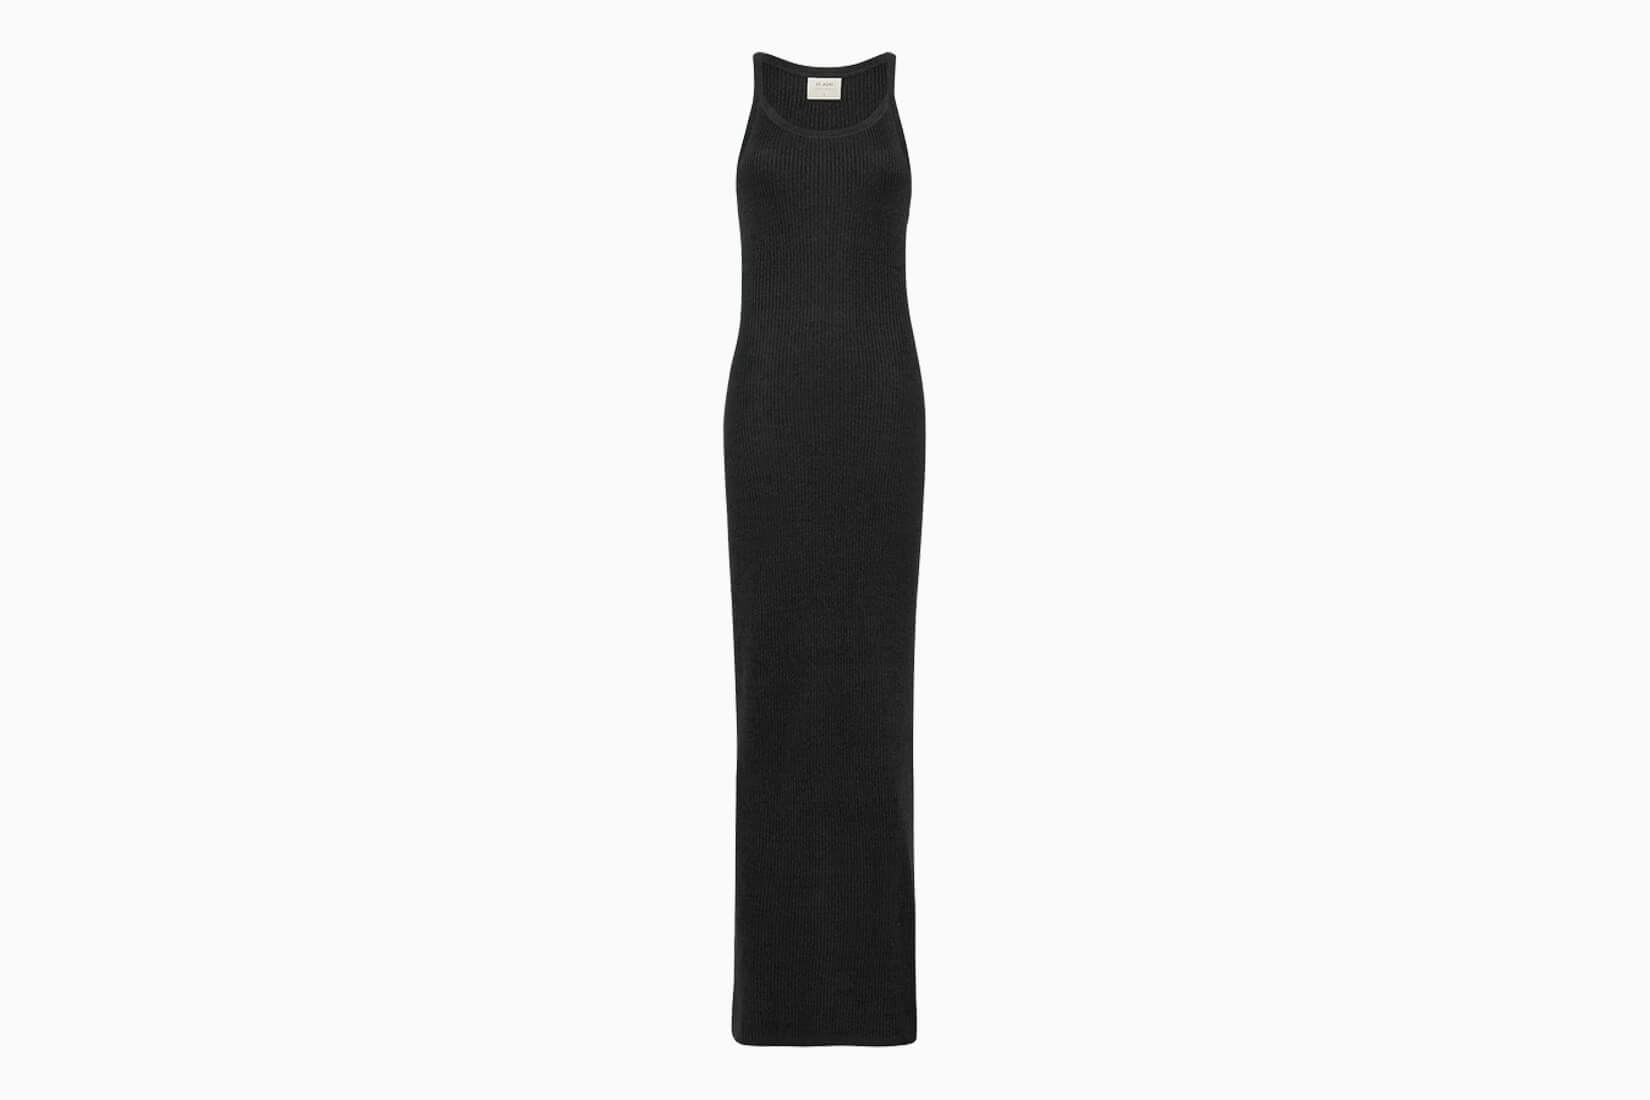 best little black dresses st agni - Luxe Digital